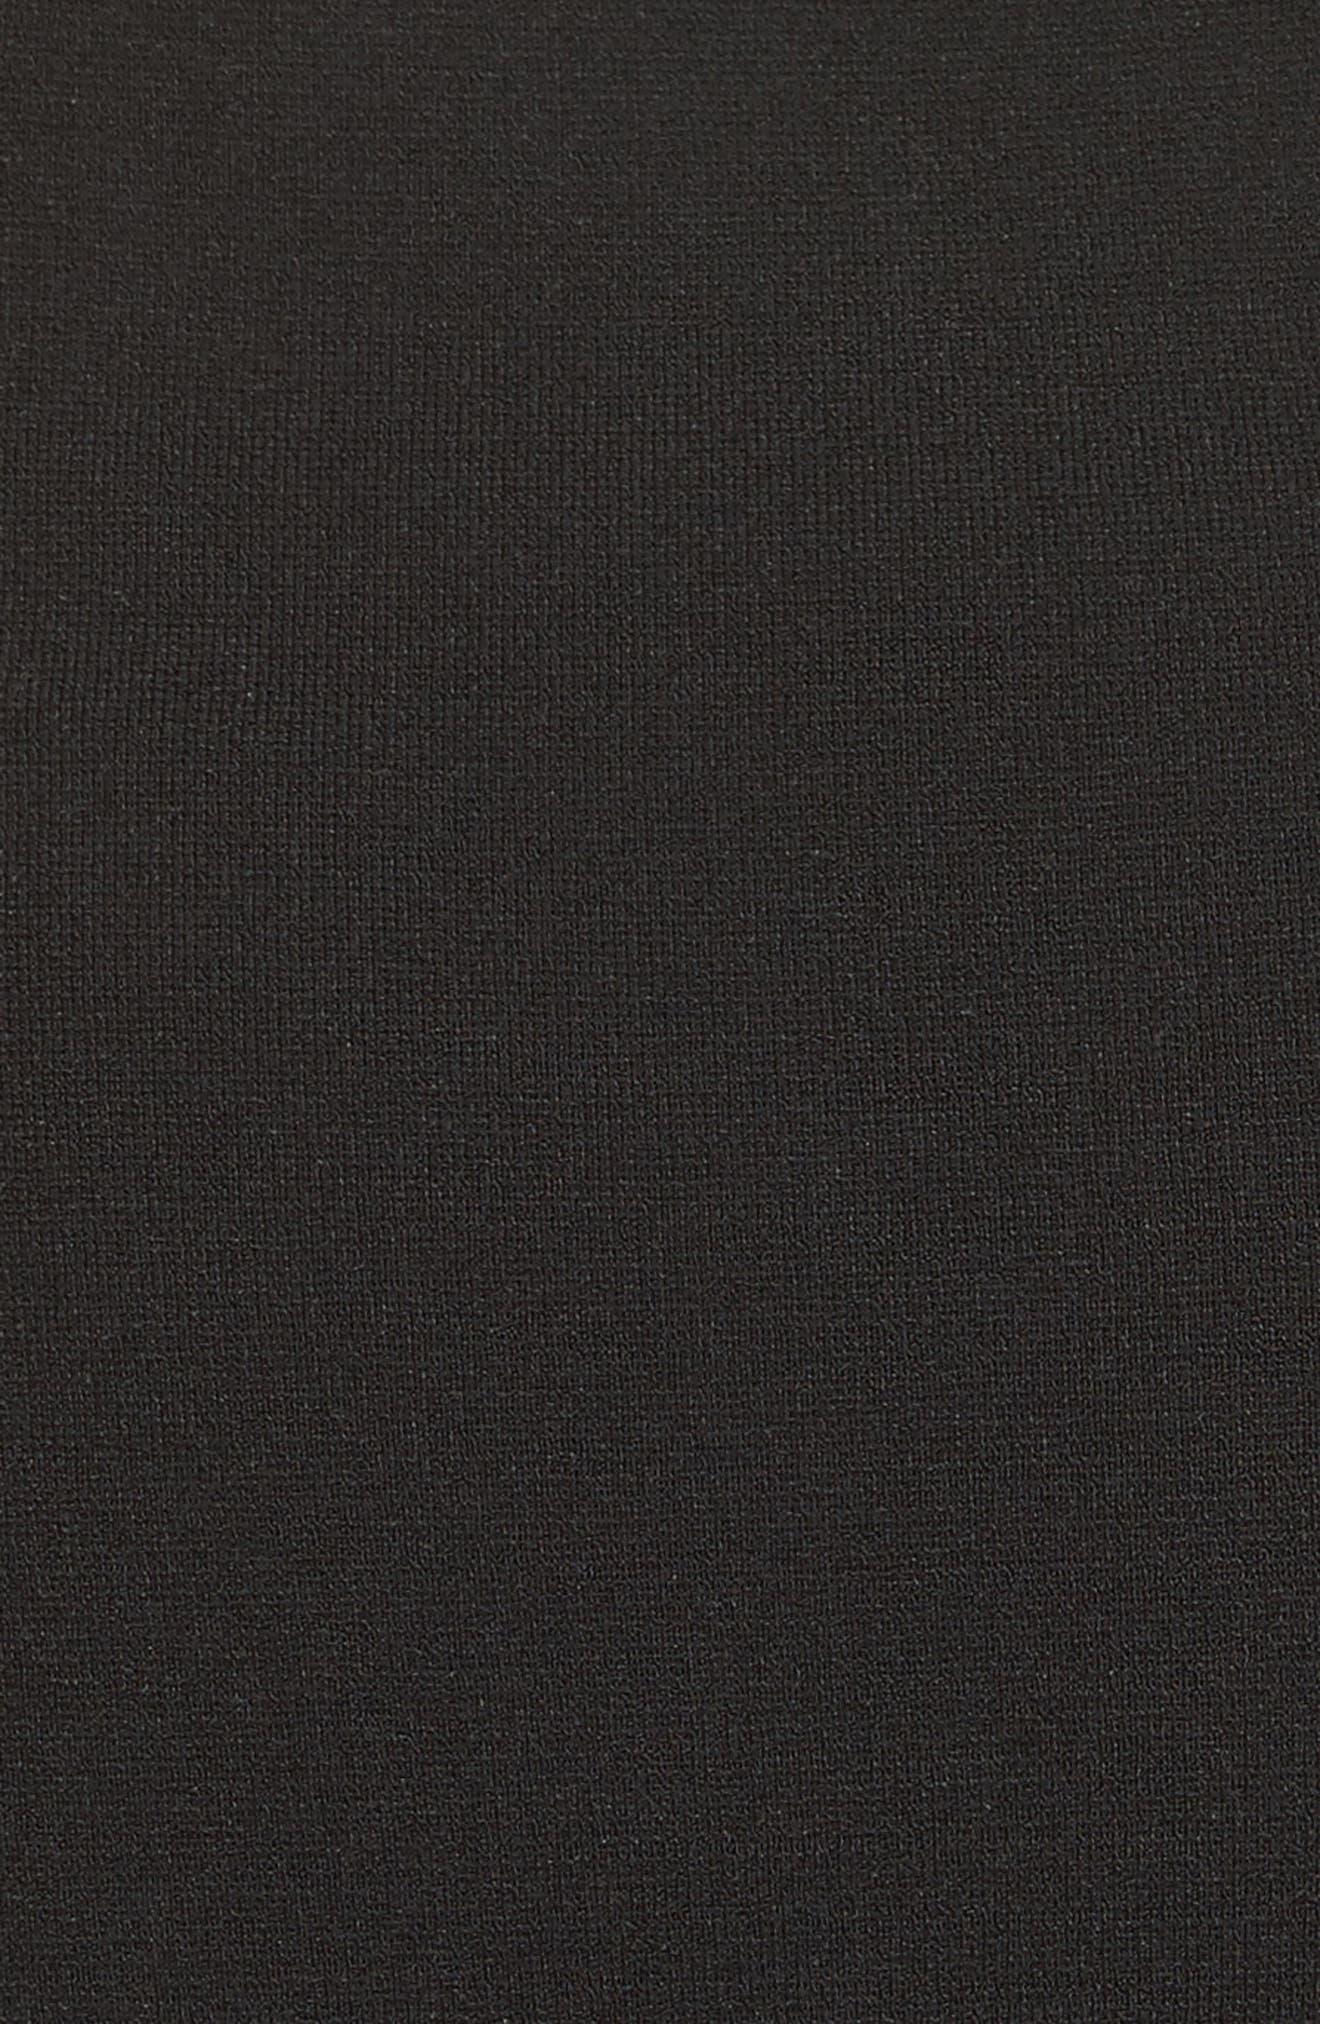 One-Shoulder Knit Dress,                             Alternate thumbnail 9, color,